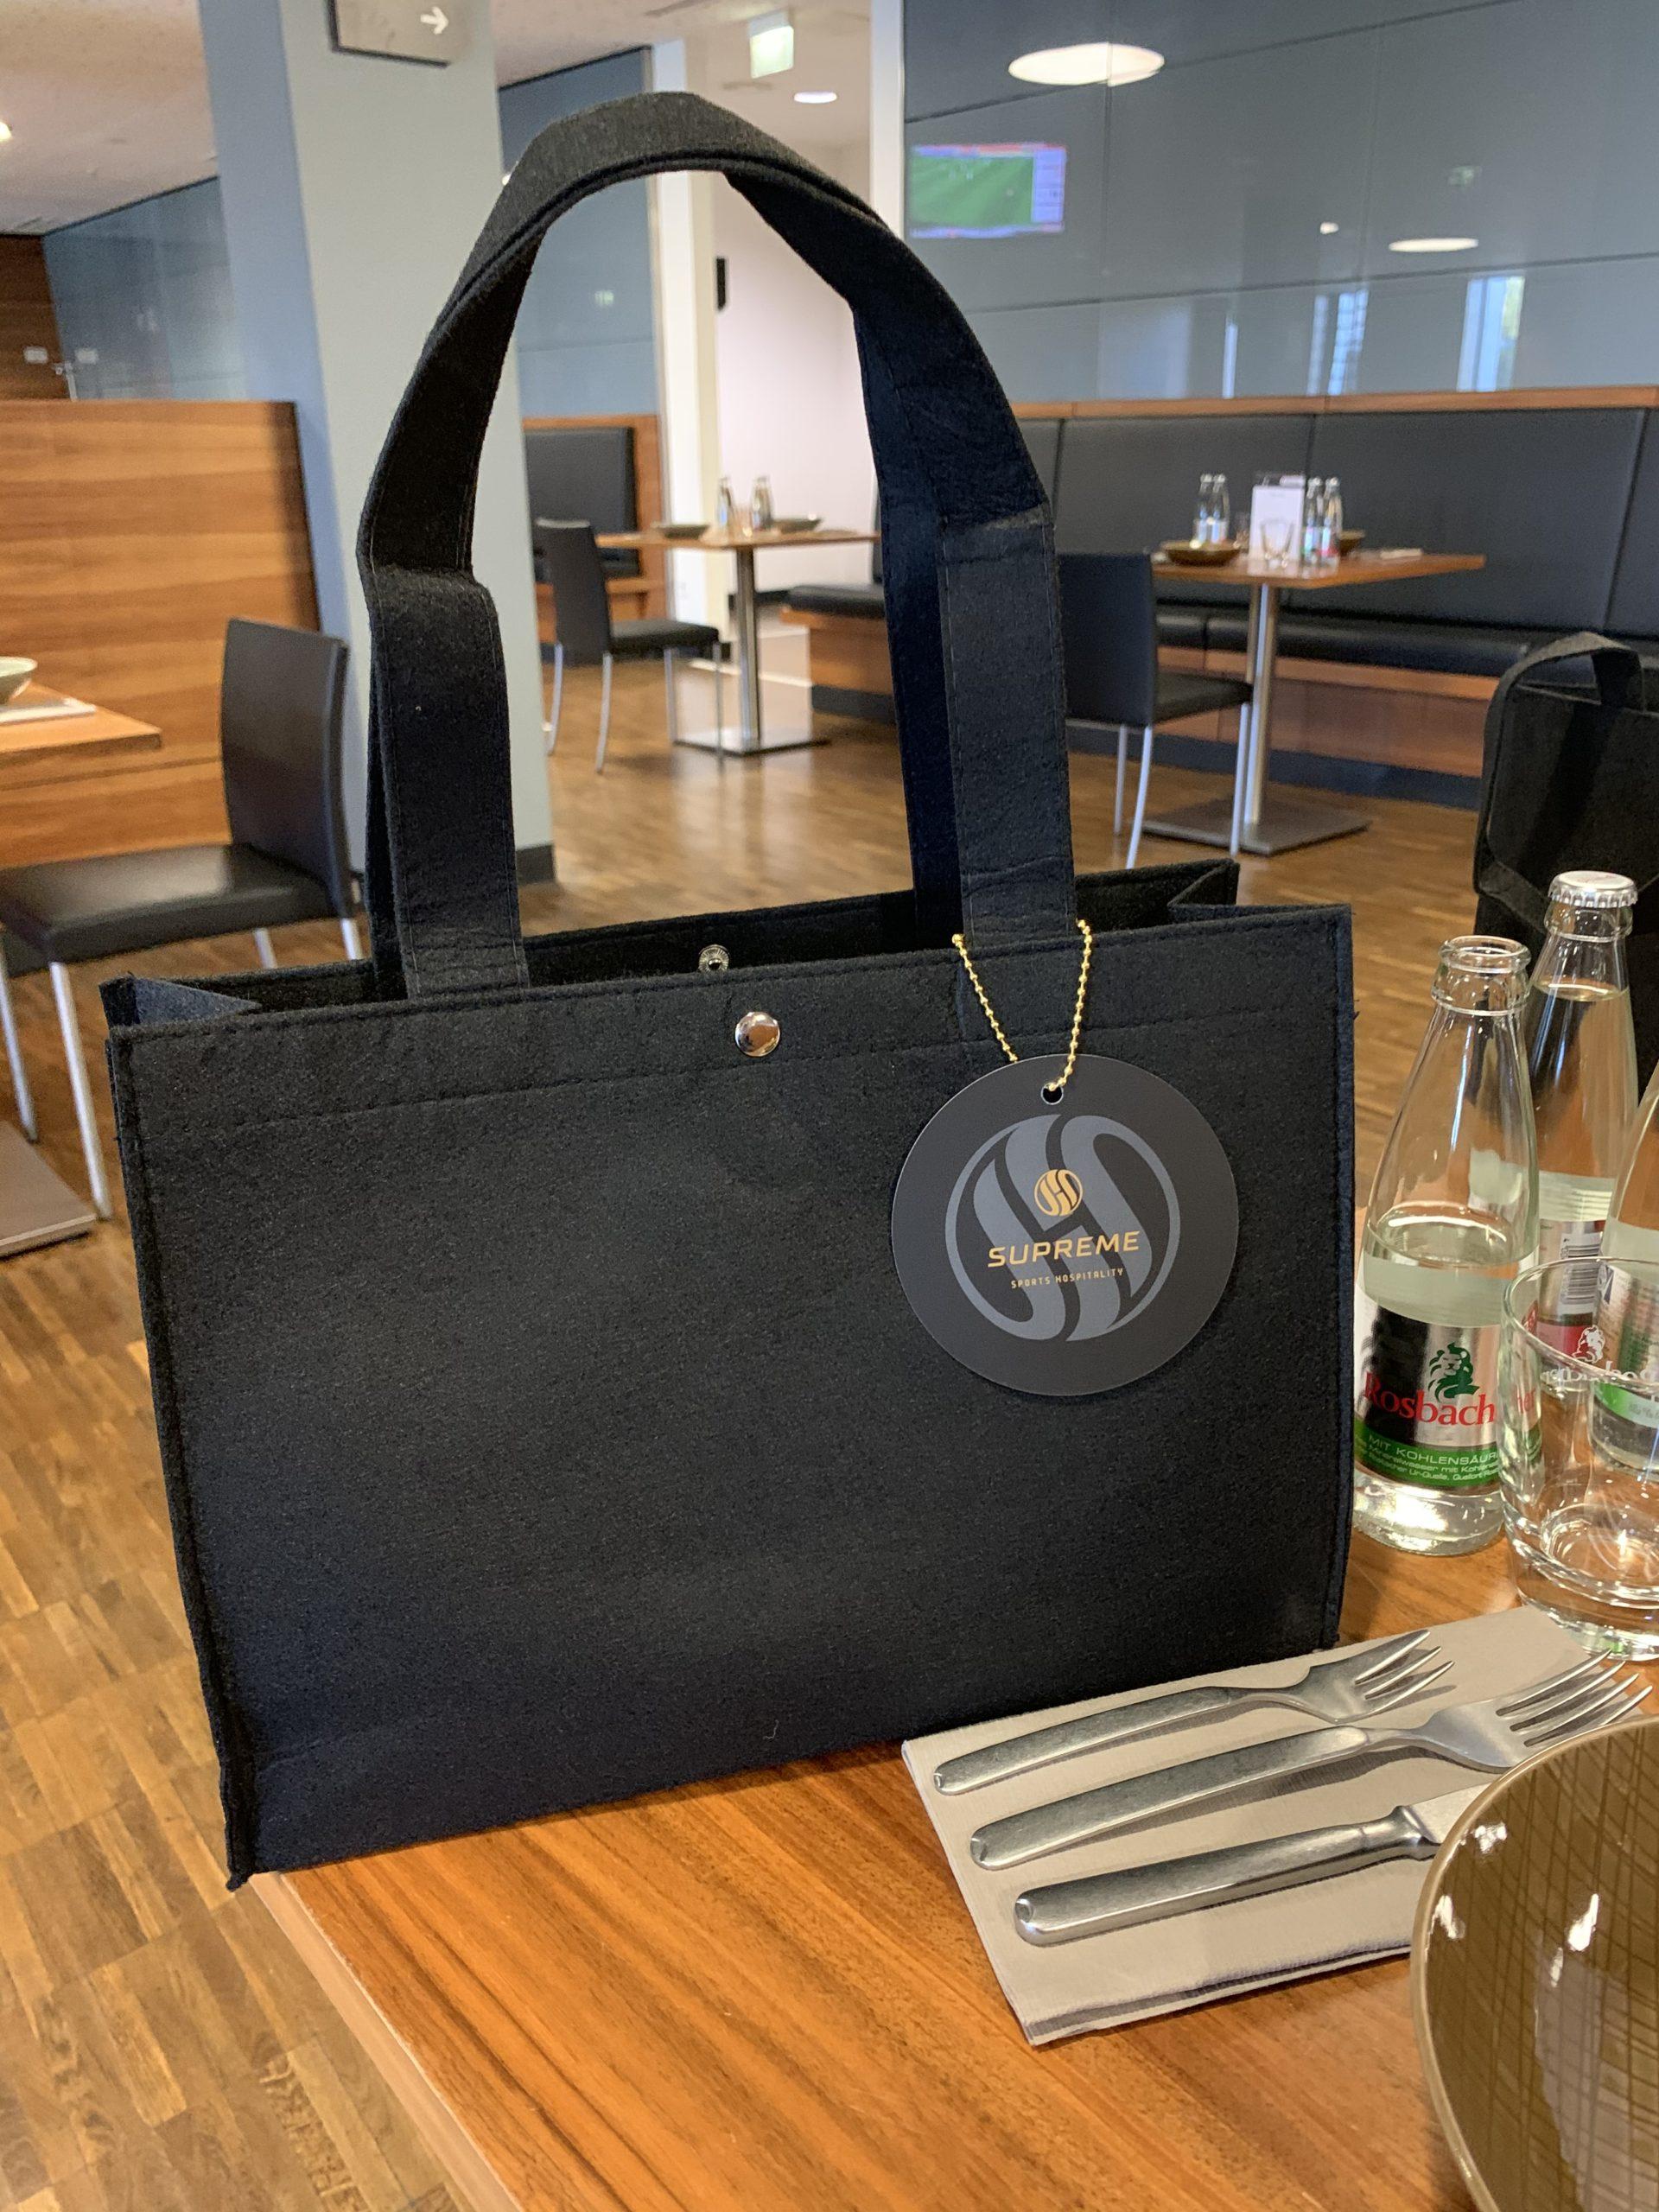 Handtasche vom SGE-Caterer wie bei https://lovely-handbag.de